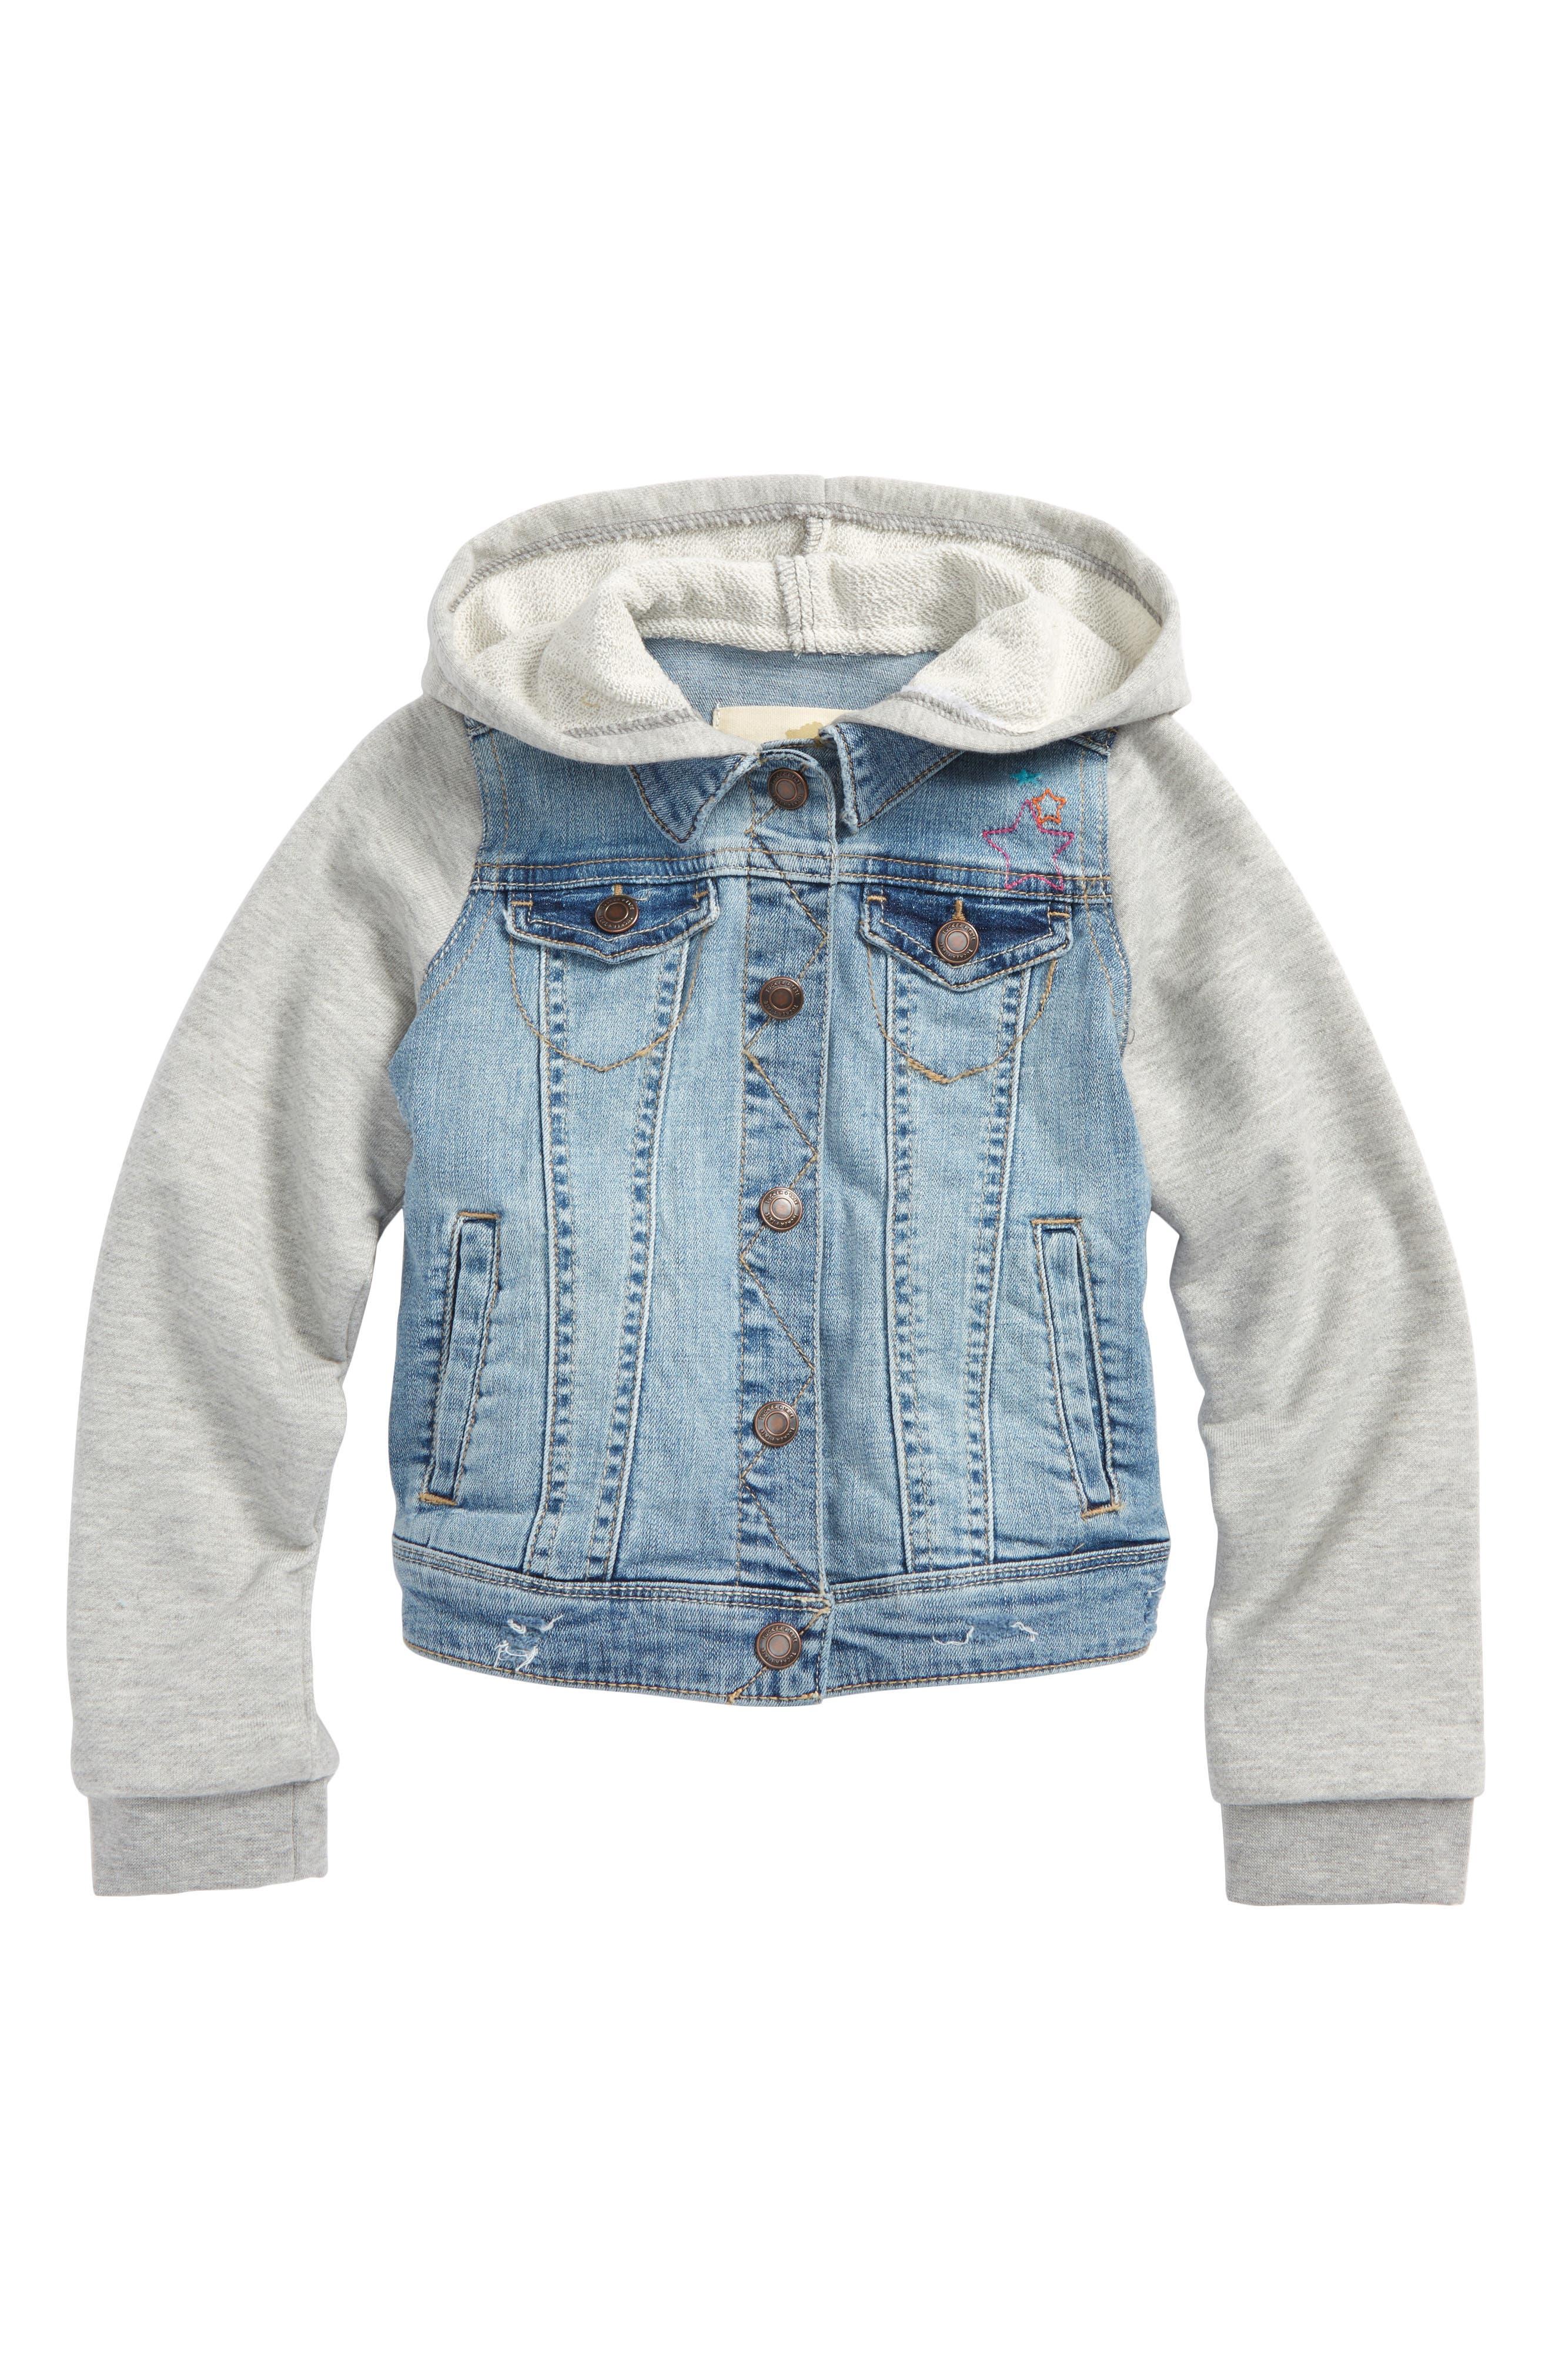 Embellished Hooded Denim Jacket,                             Main thumbnail 1, color,                             Bleached Out Wash